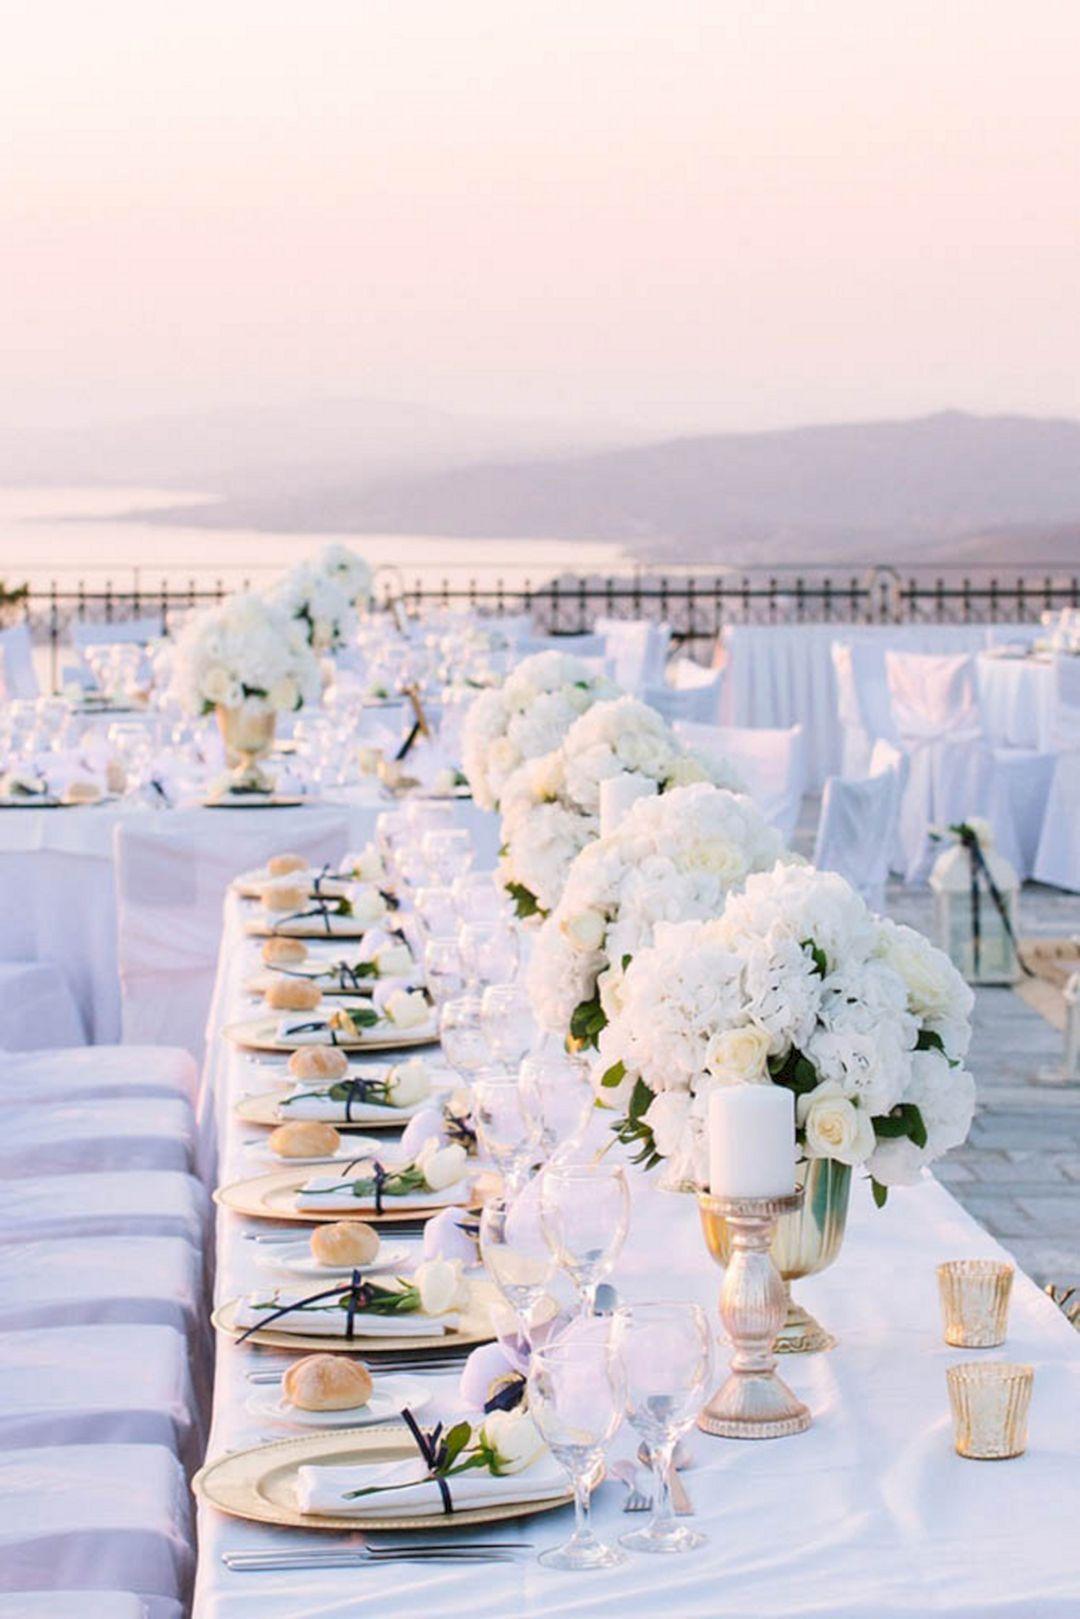 Simple wedding decoration ideas for reception   Most Popular White Wedding Decoration Ideas For Your Elegant